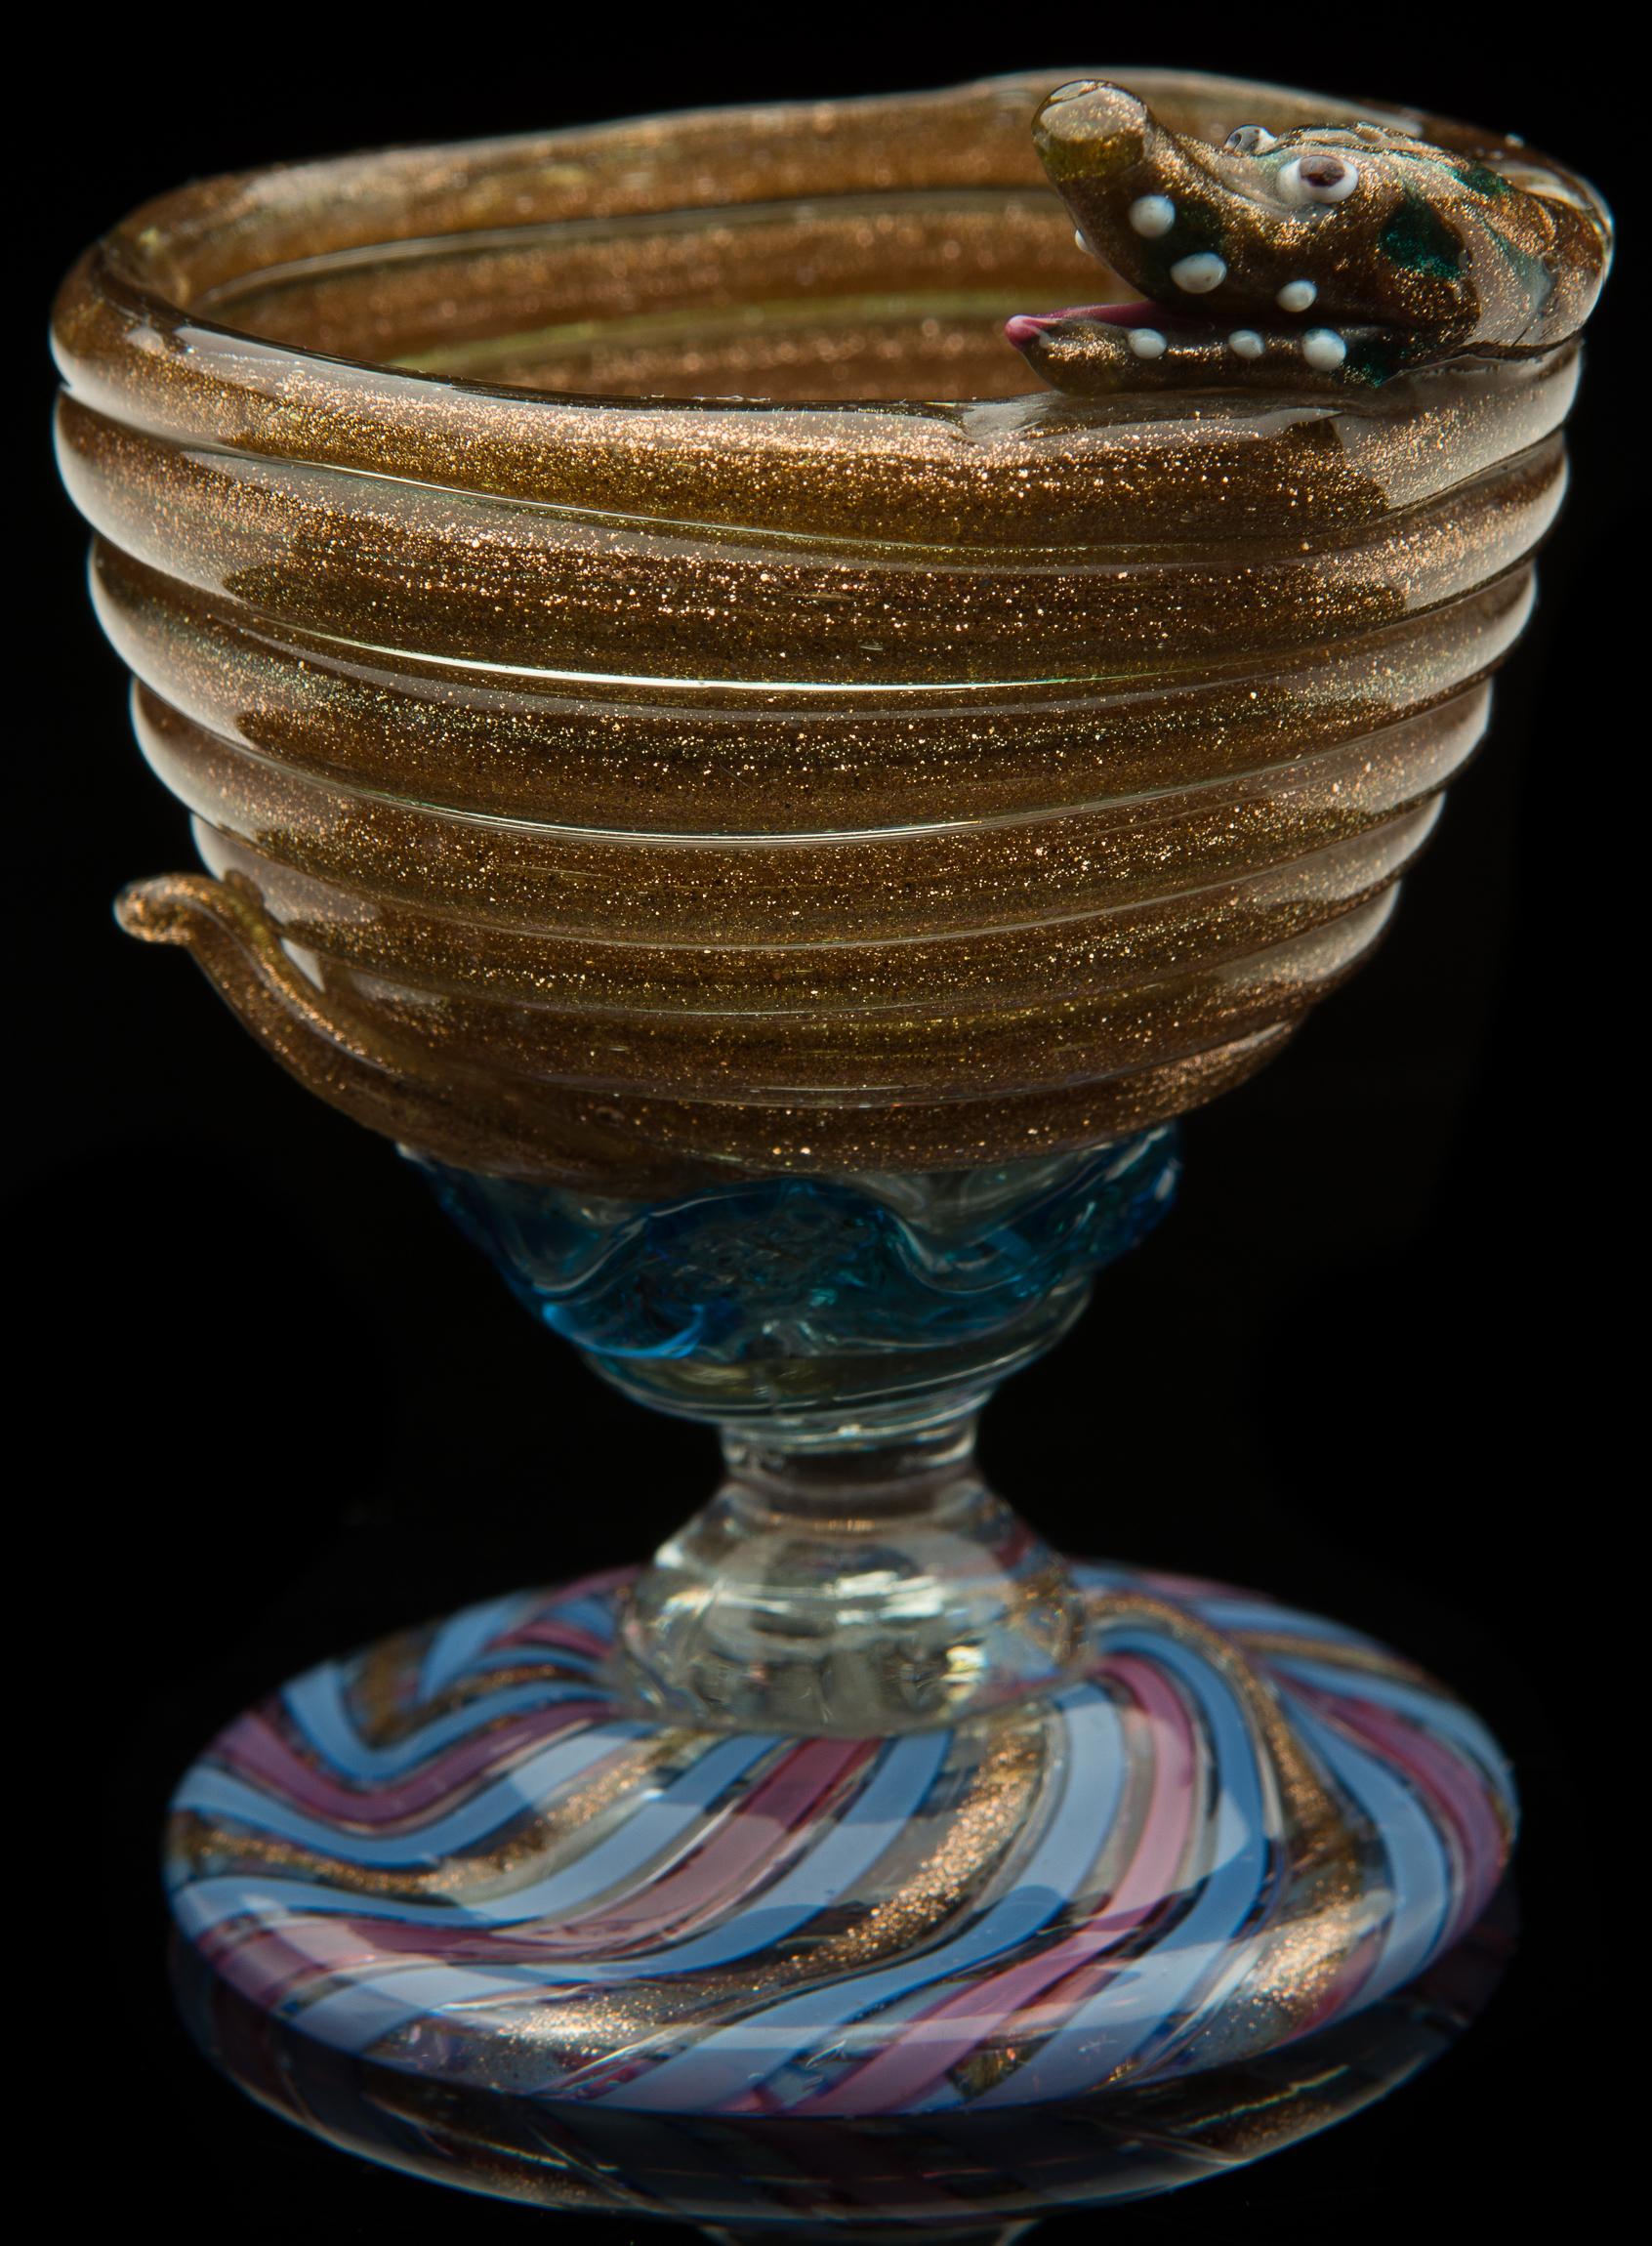 Barovier for Salviati,  Serpent Cup  (circa 1870, glass, 2 15/16 inches), VV.486